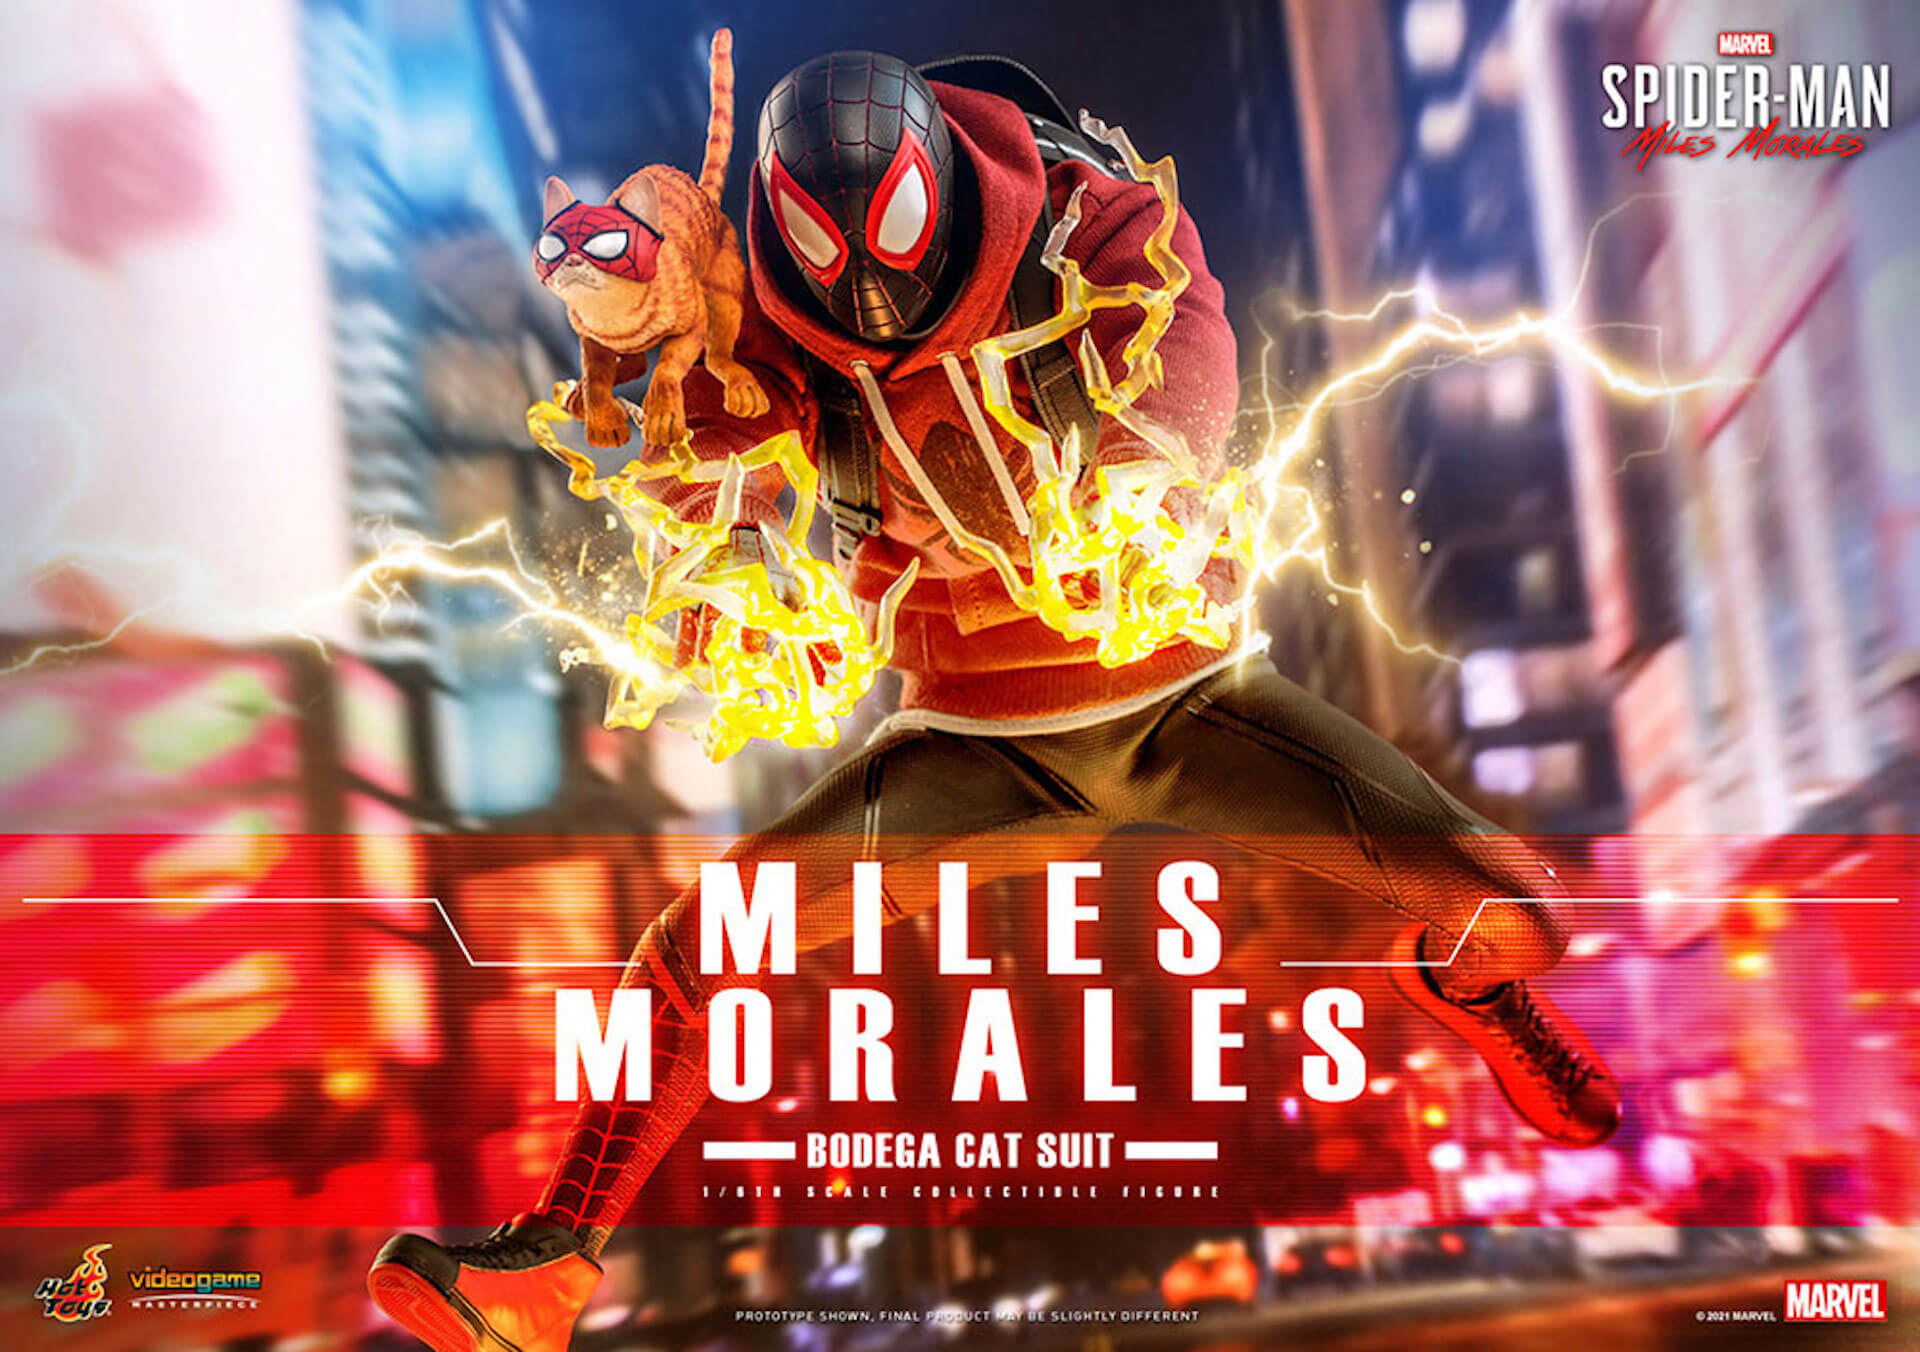 『Marvel's Spider-Man:Miles Morales』のスパイダーマンがホットトイズで超精巧なフィギュアになって登場! art210601_spiderman_hottoys_7